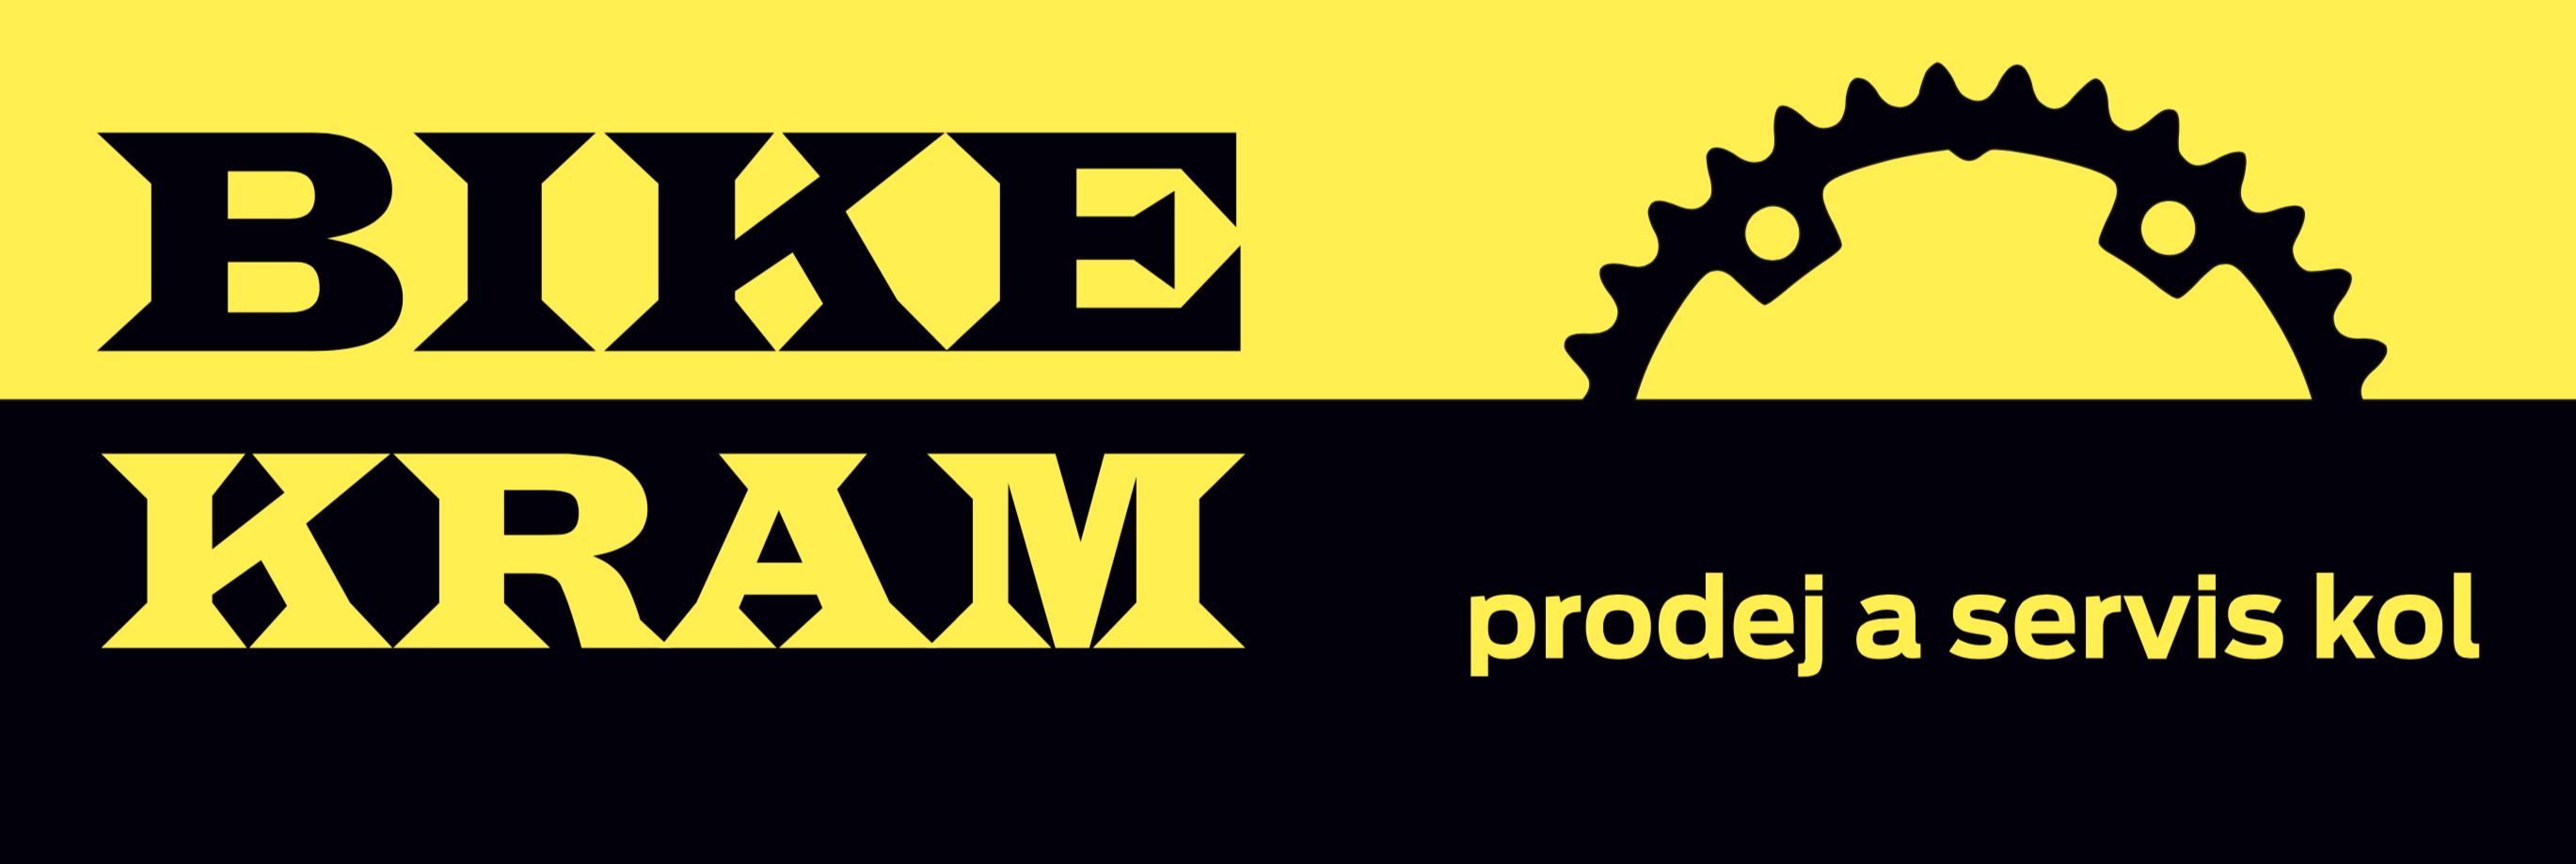 BIKEKRAM.cz